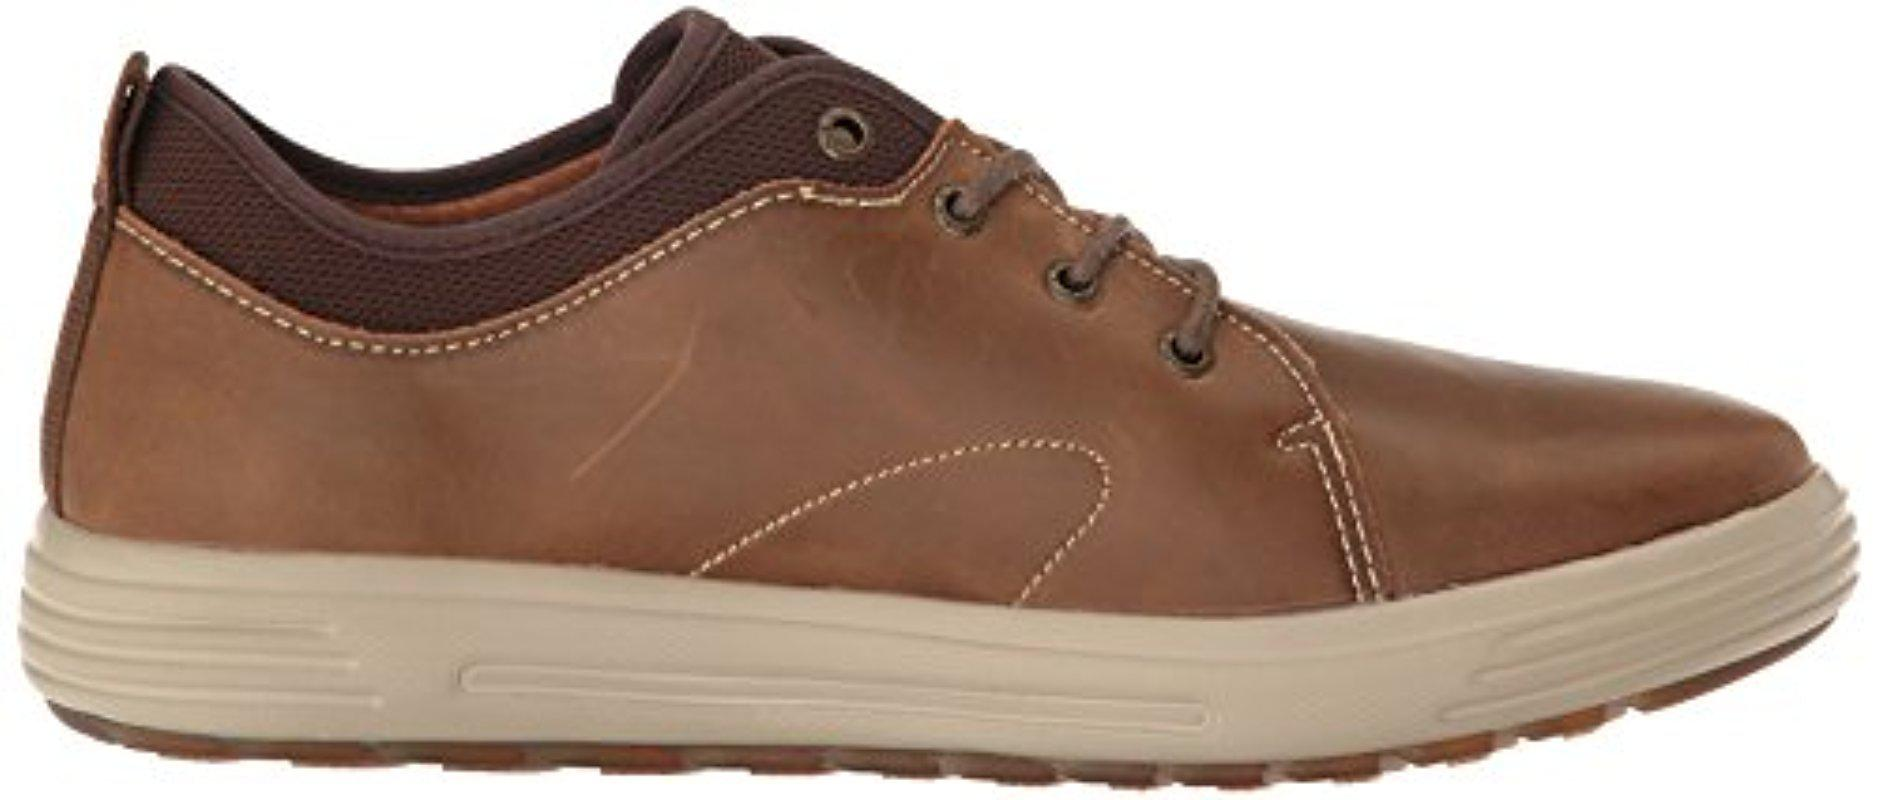 Skechers Leather Porter Elden Oxford in